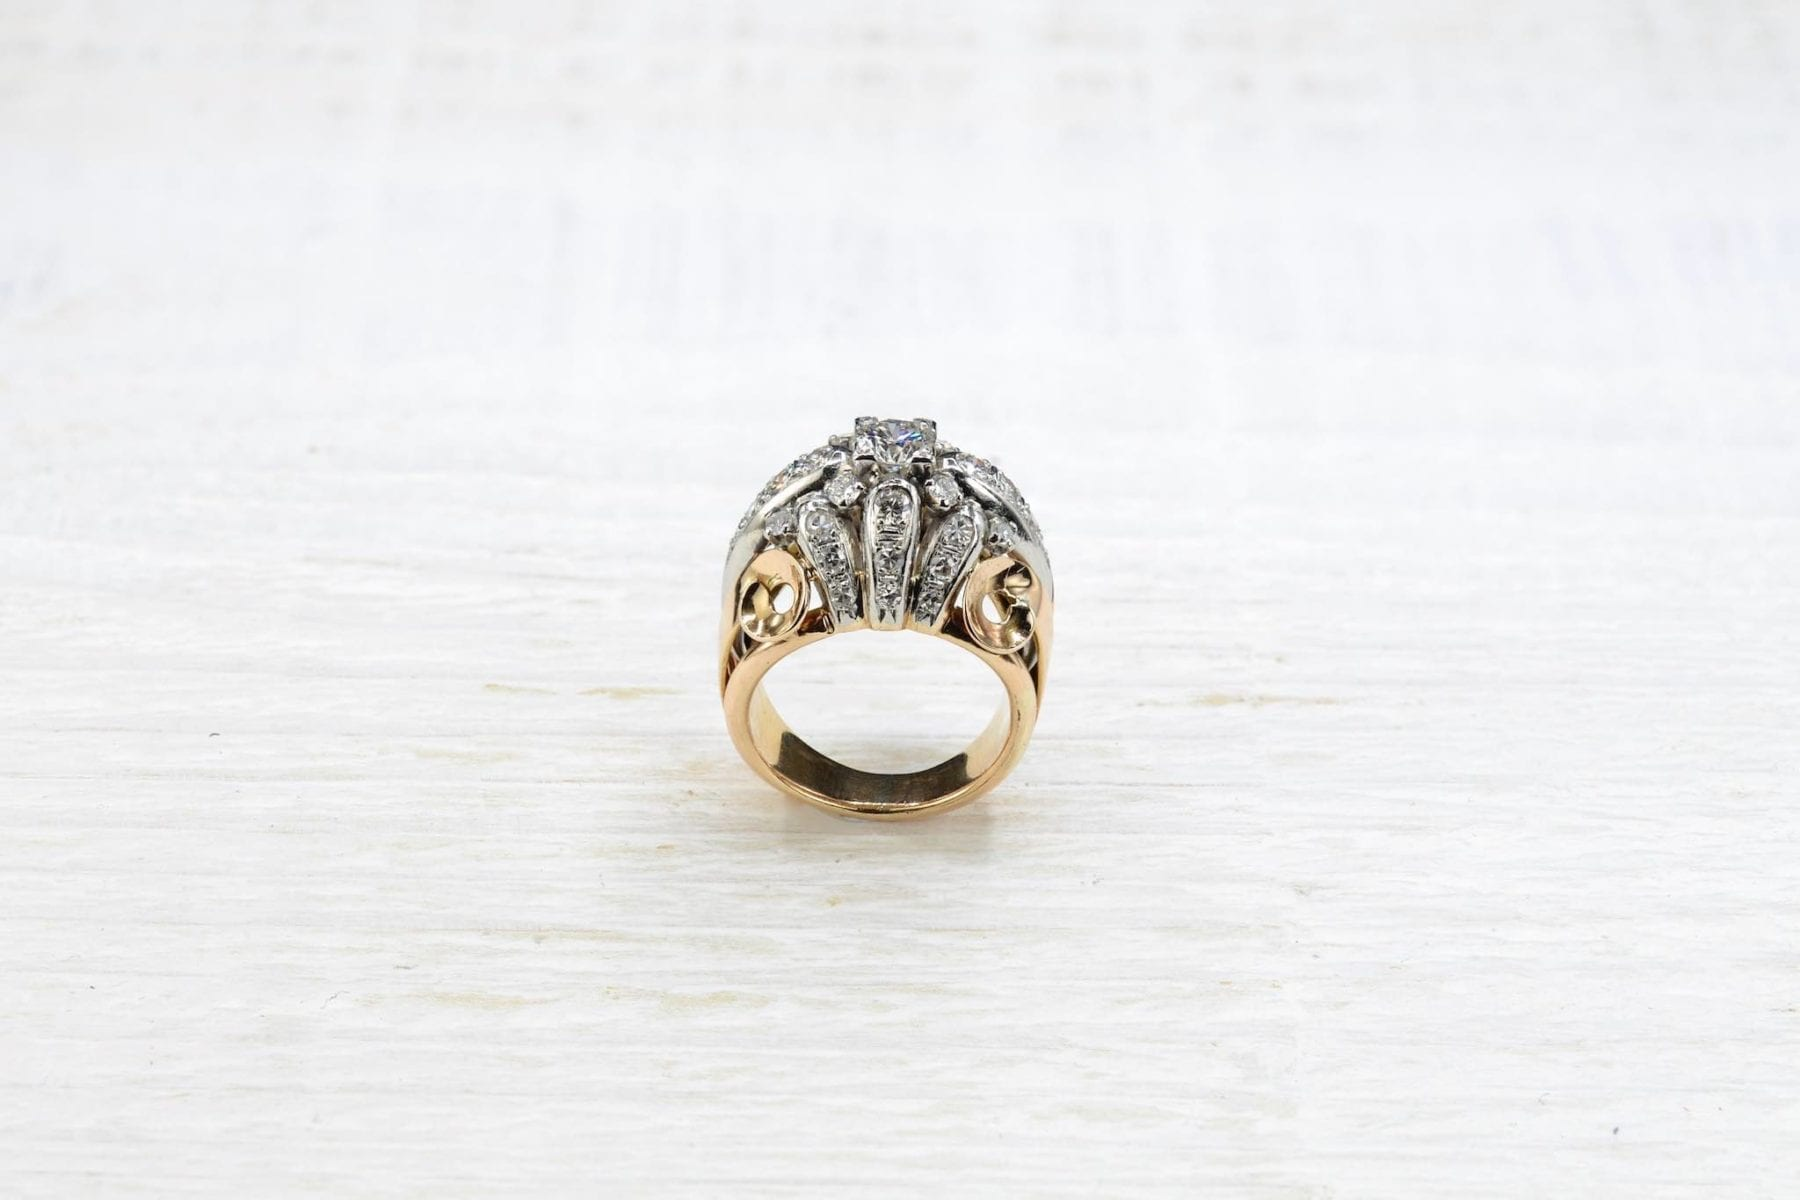 Bague 1950 or diamants